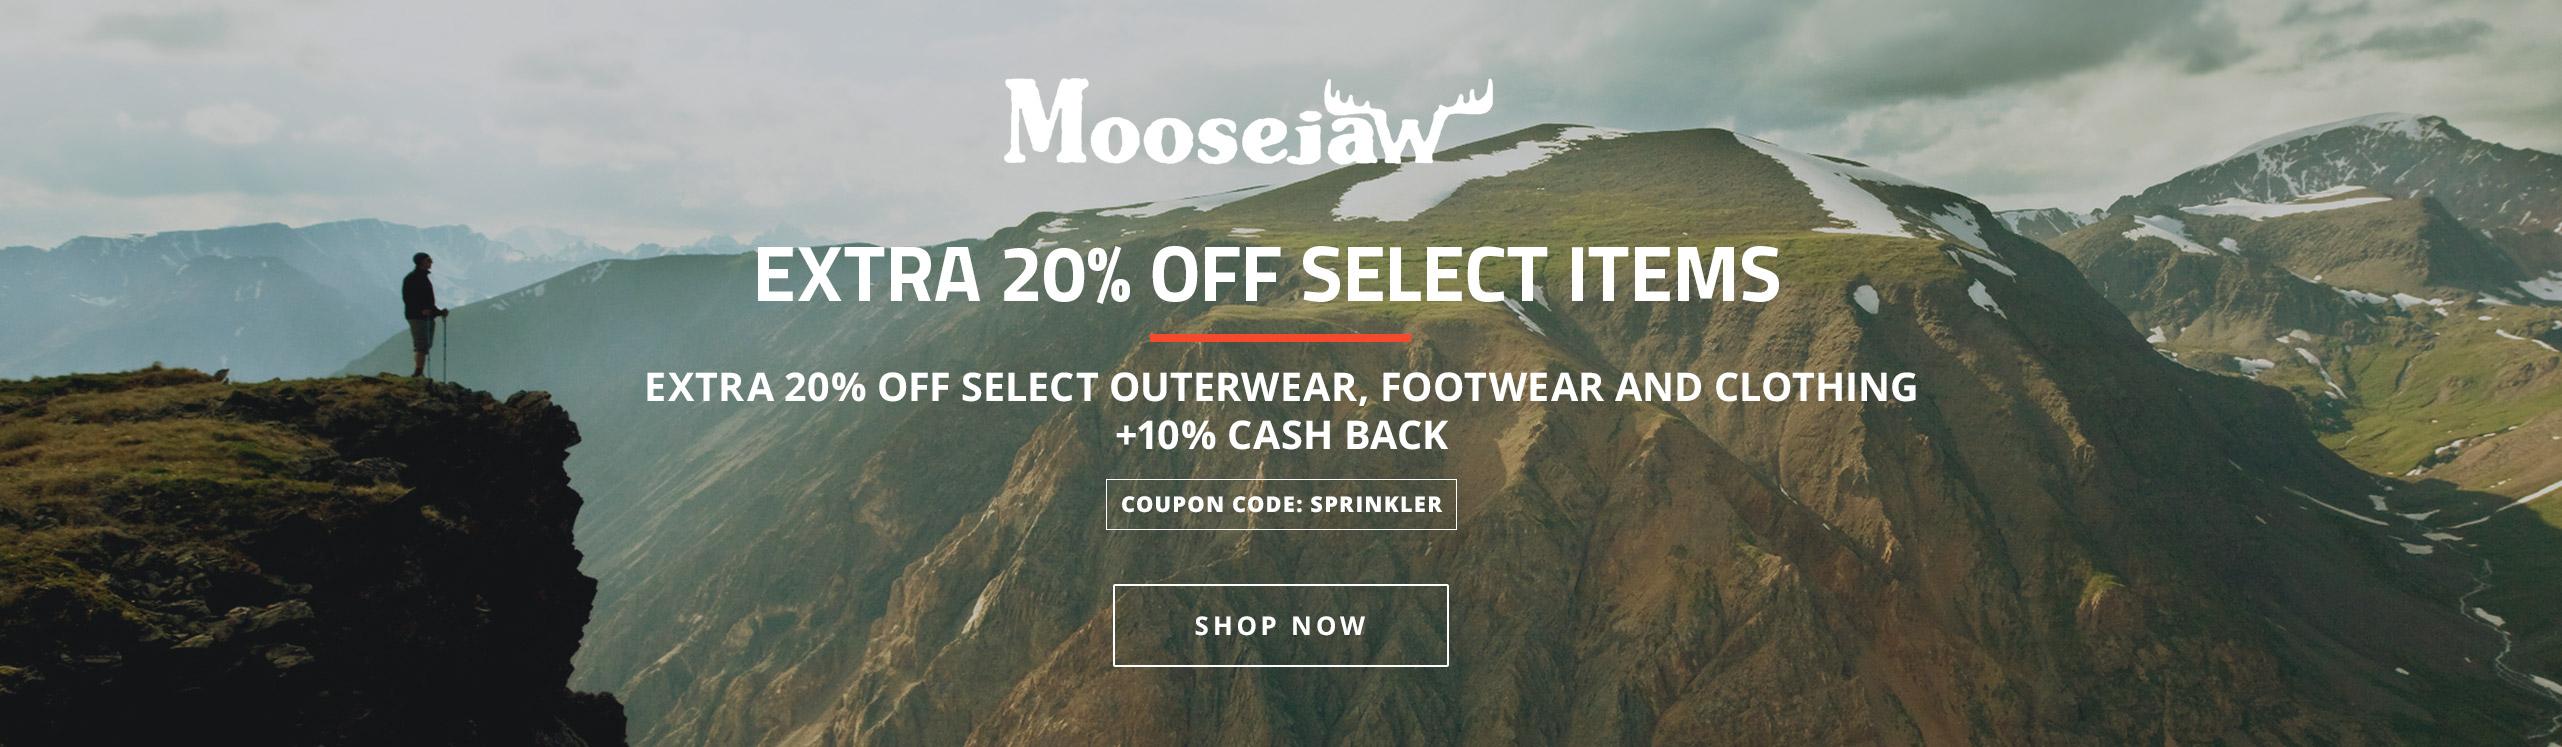 Moosejaw 20 Off